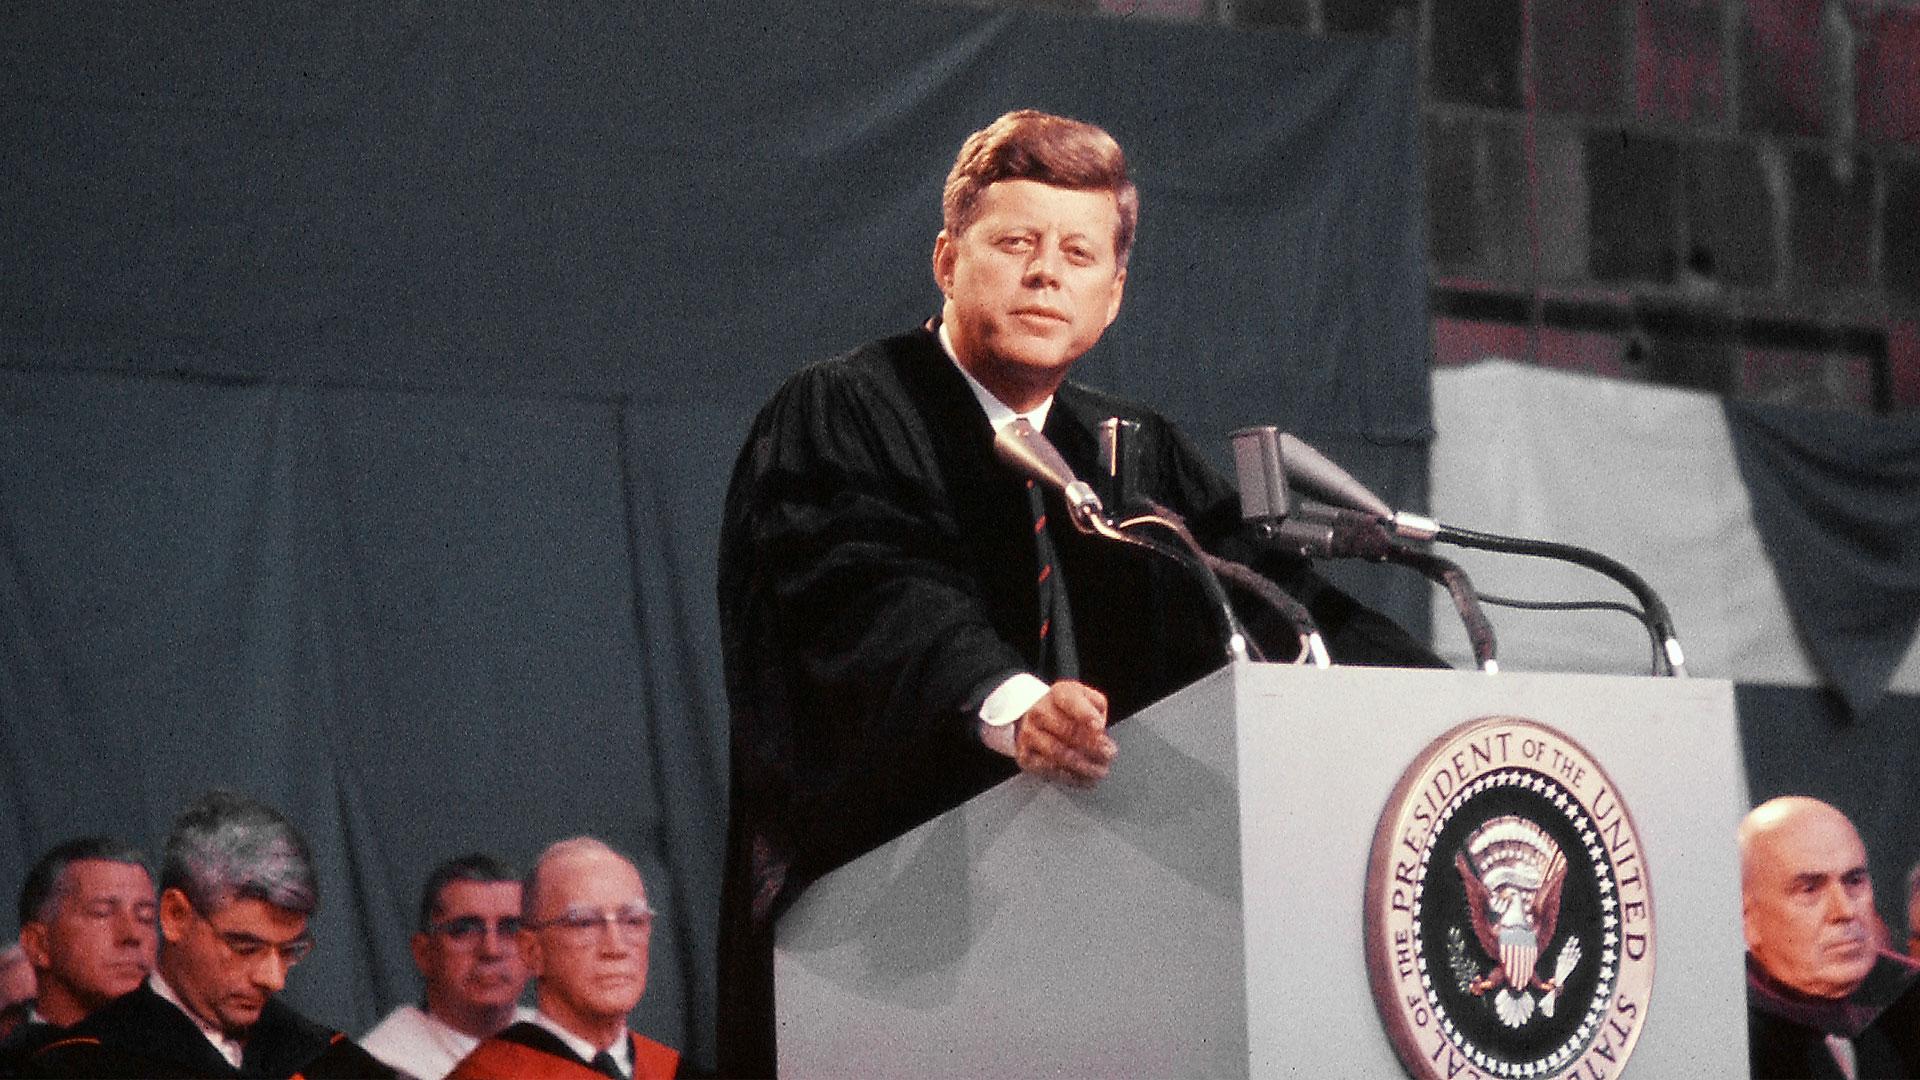 Kennedy at podium